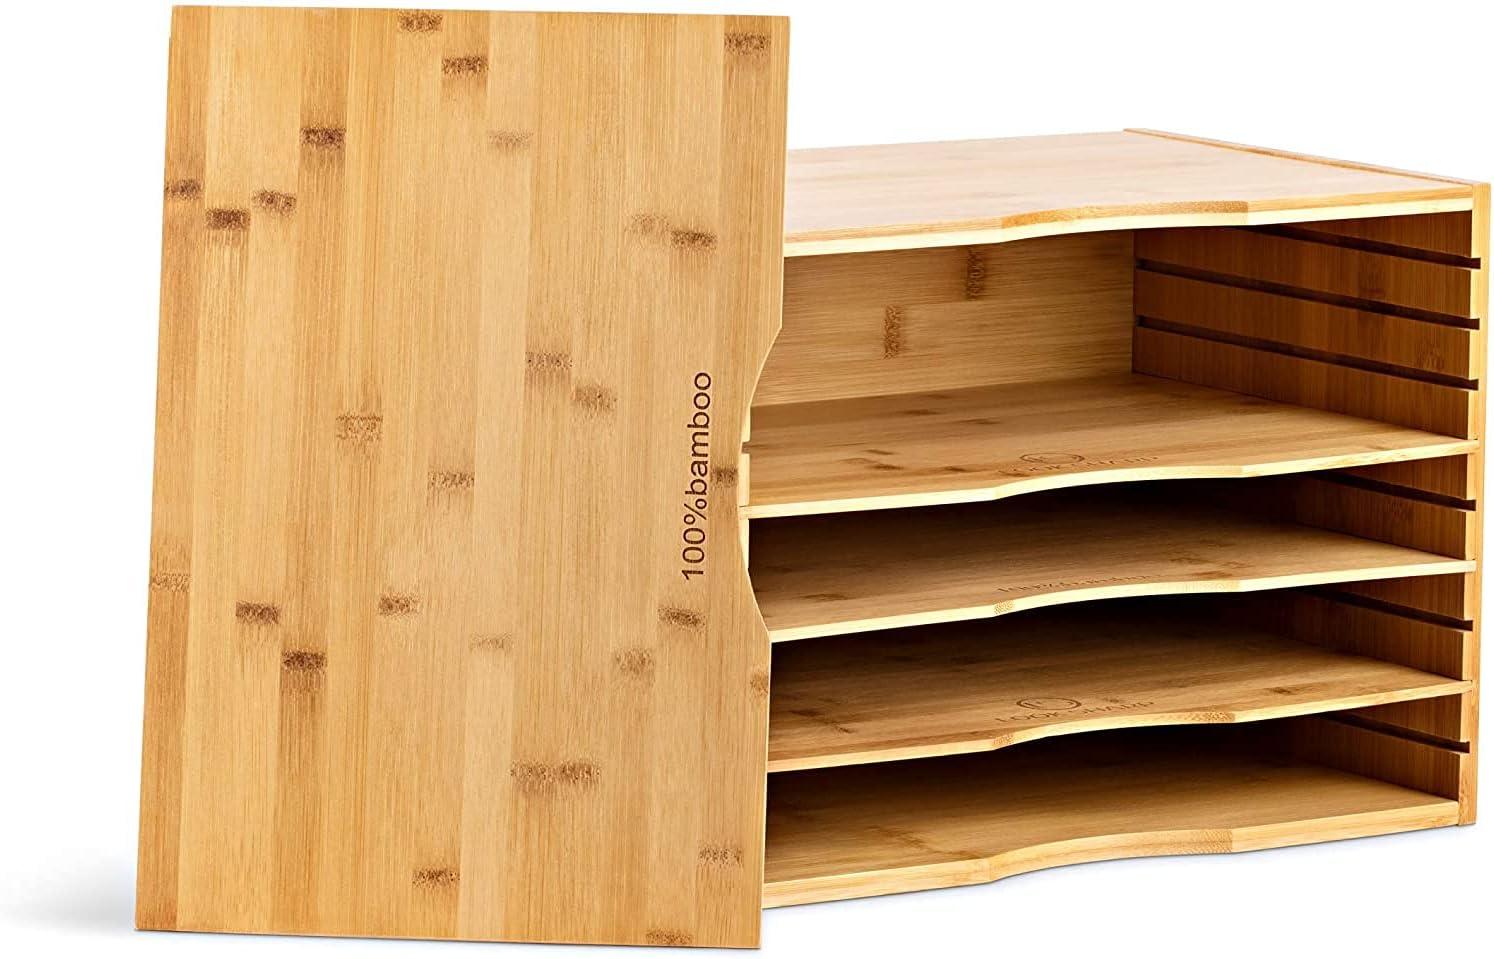 100% Bamboo Desk Rare Organizer – Gorgeous low-pricing 9 C 5 Options Shelf